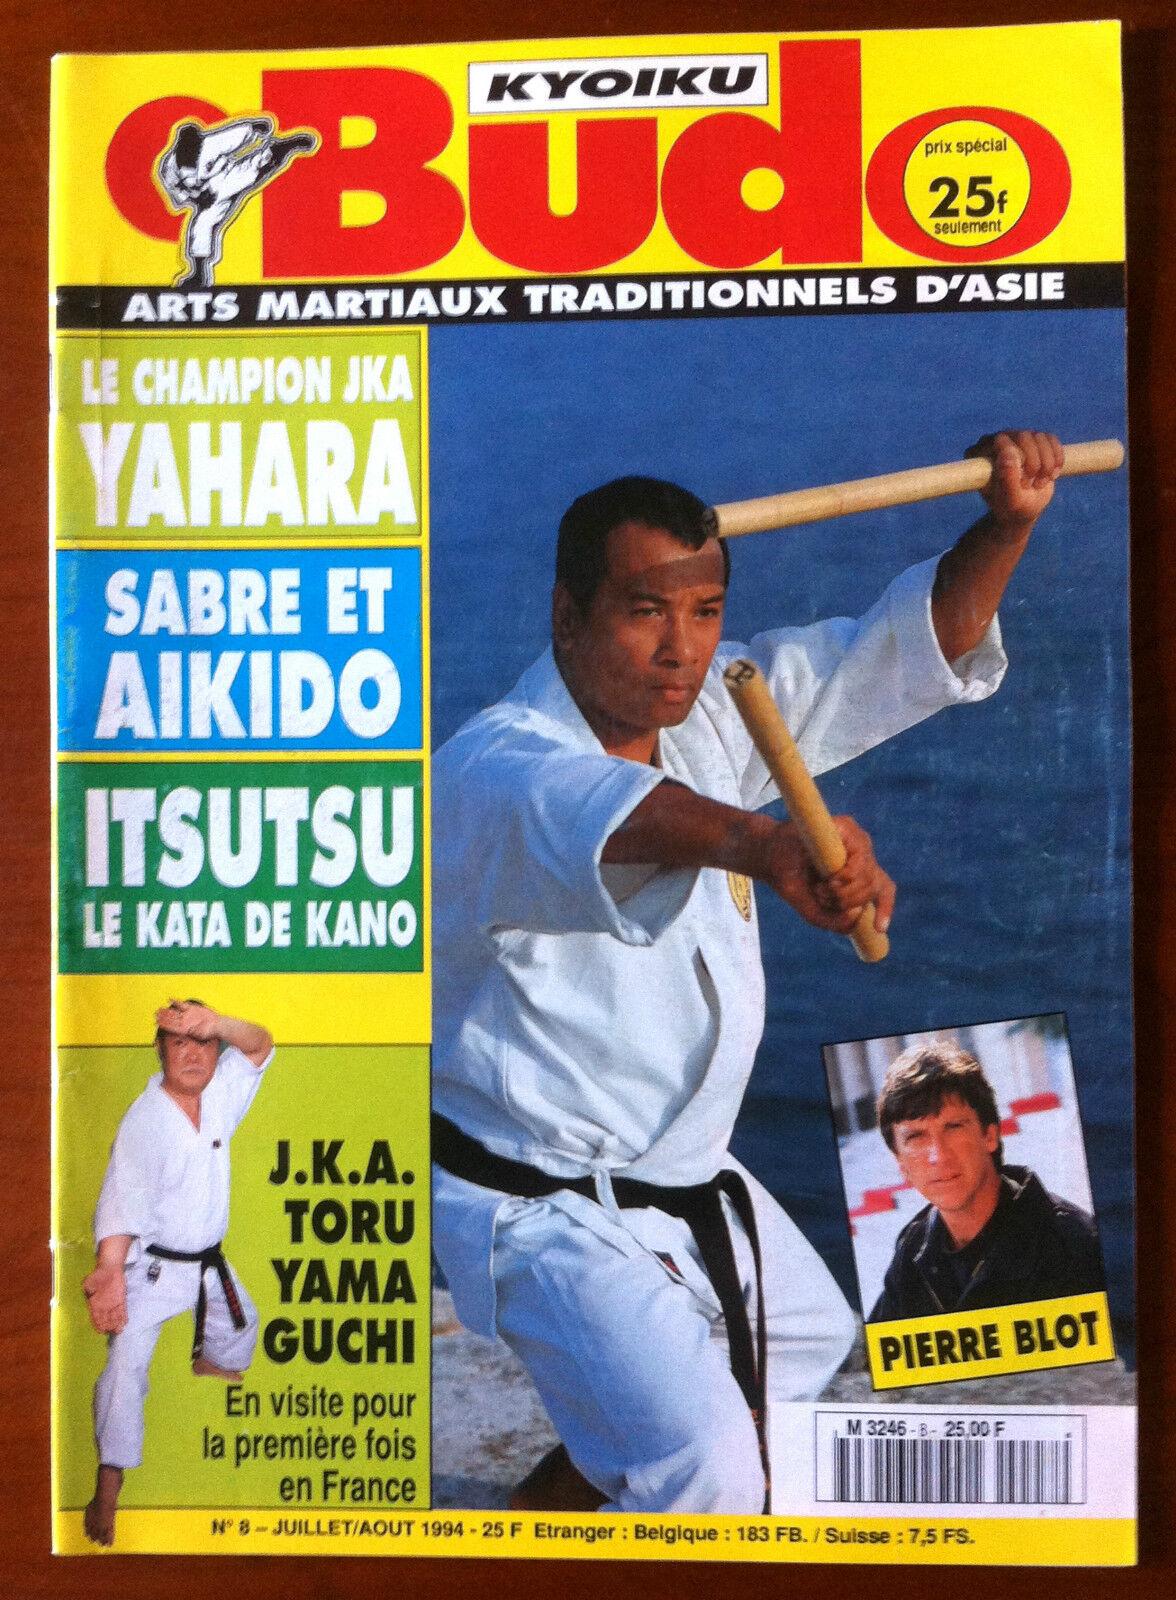 b)Arts Martiaux Kyoiku Budo n°8 n°8 n°8 du 7/1994; Pierre Blot/ Sabre et Aikido/ Yahara 10ebab